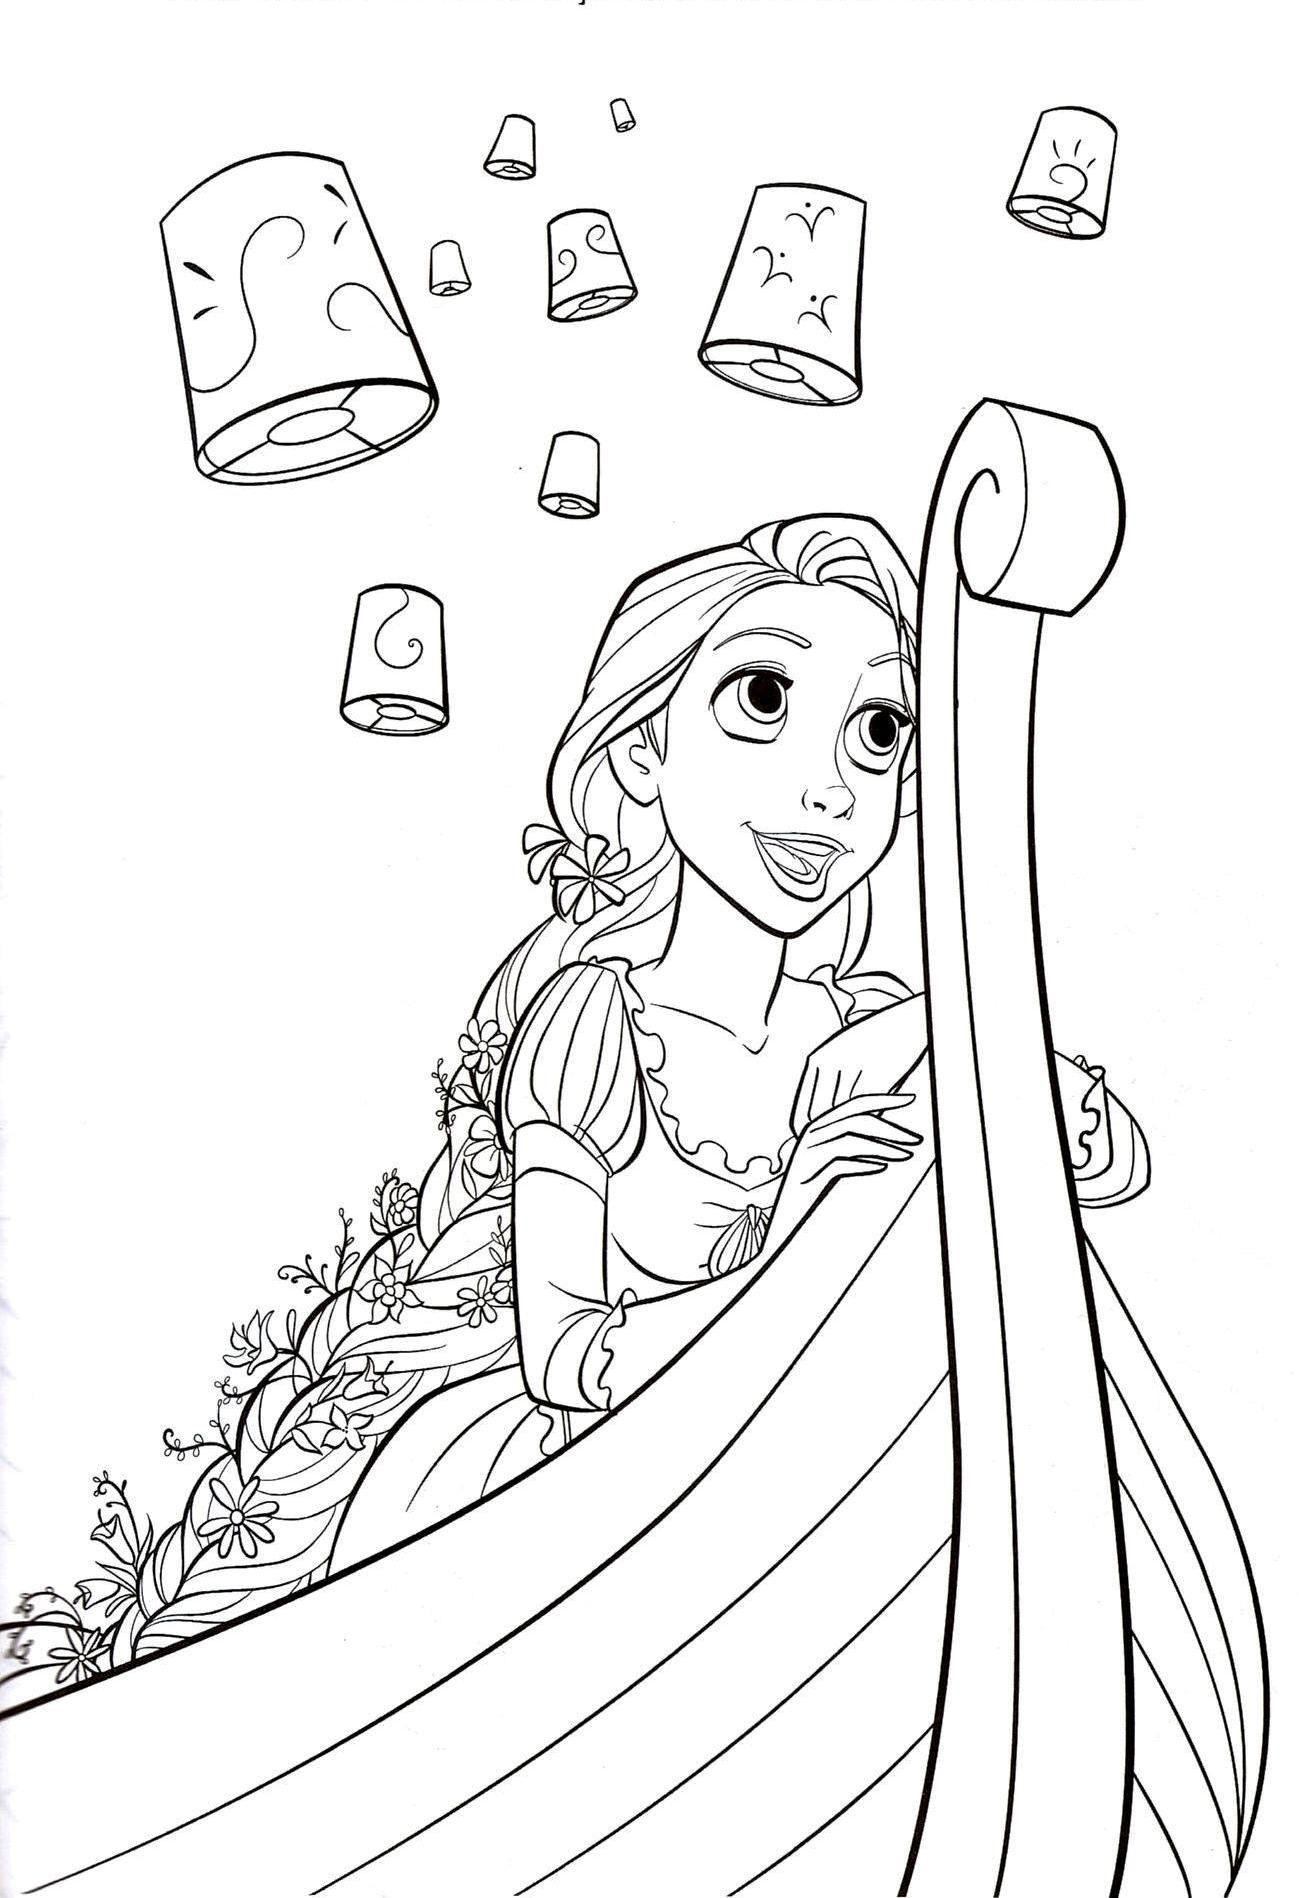 Disney Rapunzel Coloring Sheet Disney Baby Rapunzel Coloring Pages Disney Princ Tangled Coloring Pages Princess Coloring Pages Disney Princess Coloring Pages